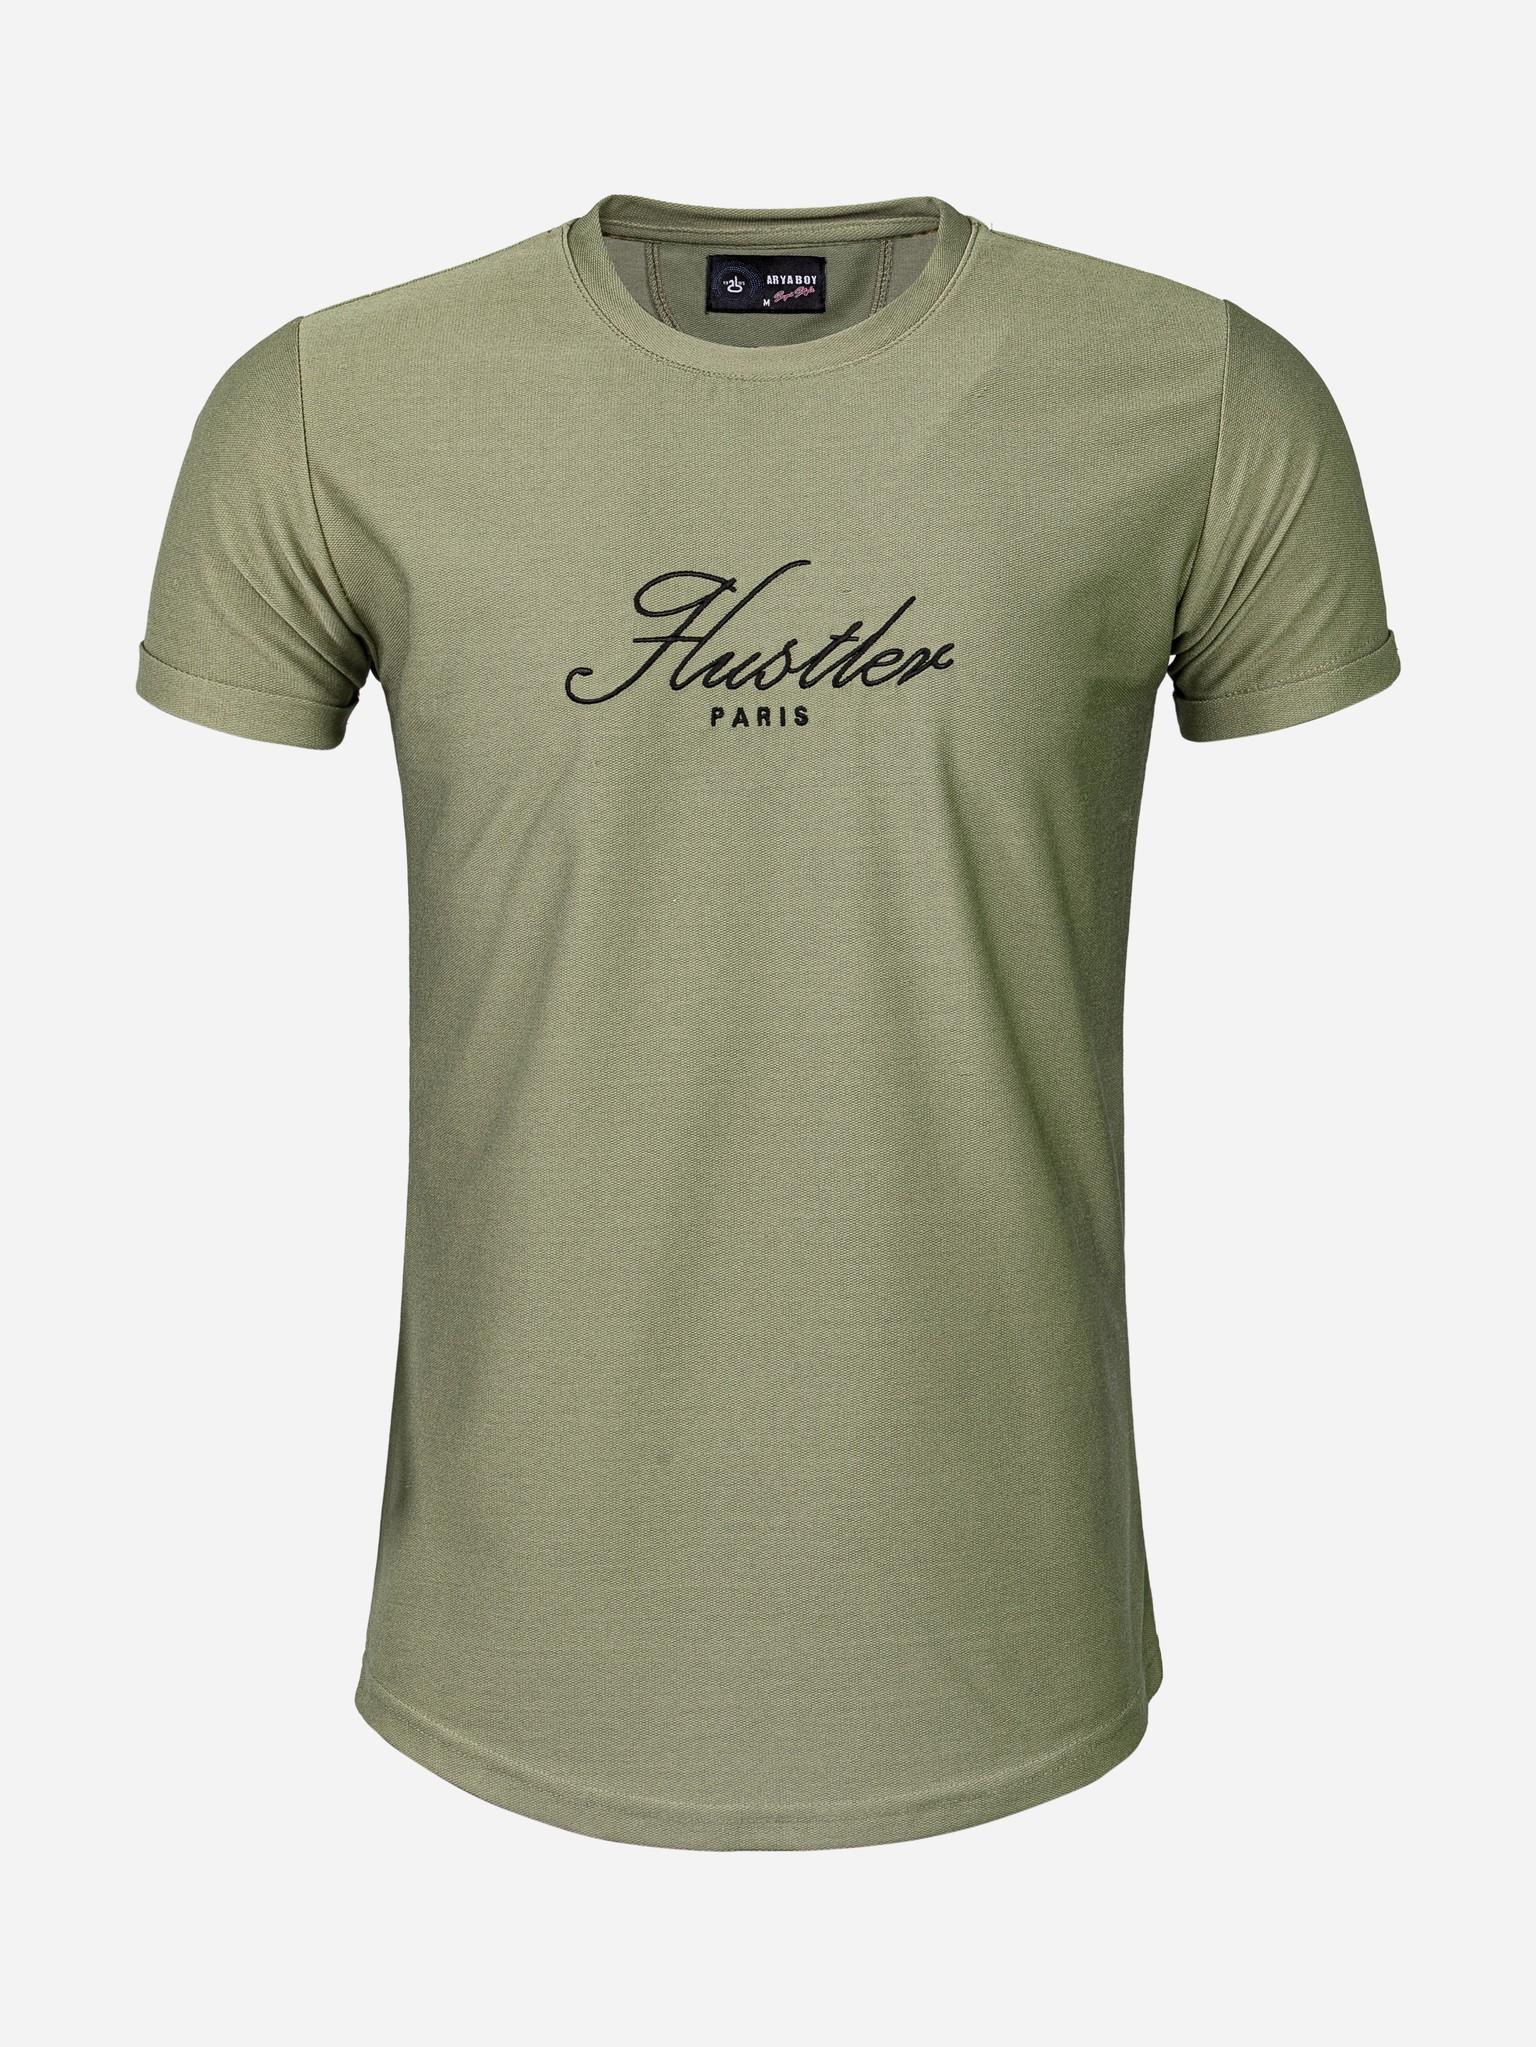 Wam Denim T-Shirt 89298 Khaki Maat: S